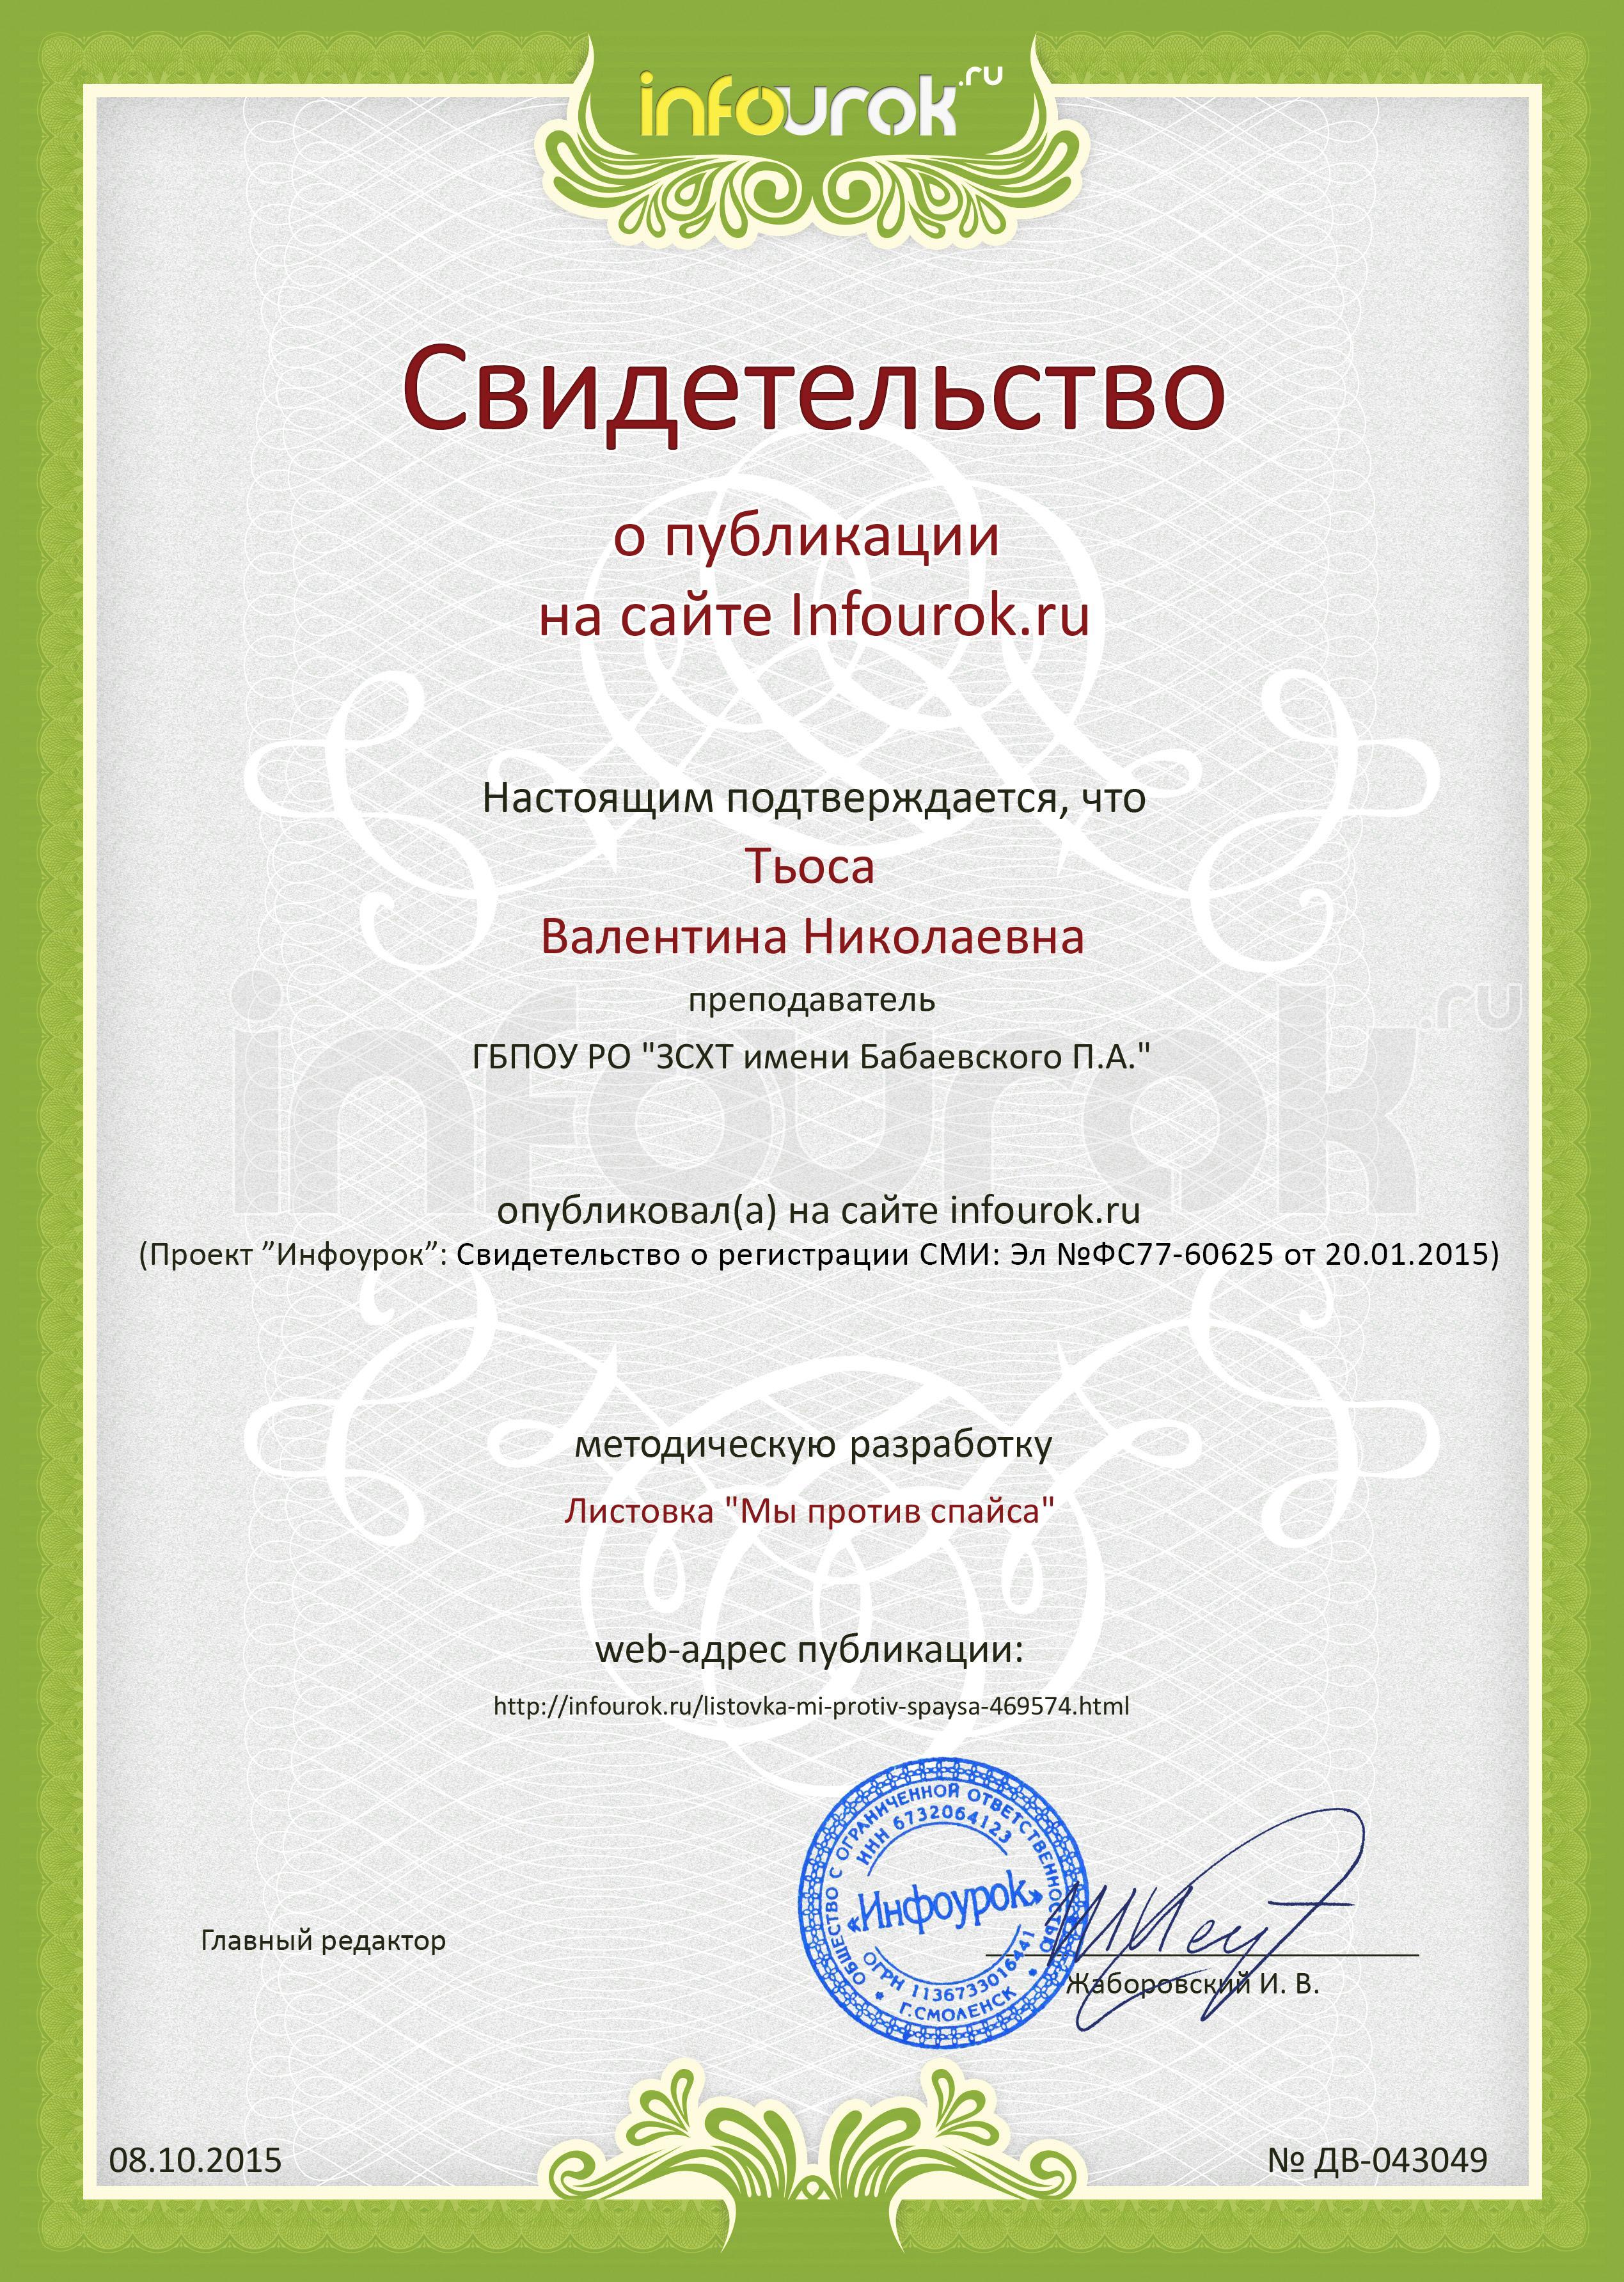 C:\Users\user\Desktop\награды\Сертификат проекта Infourok.ru № ДВ-043049.jpg